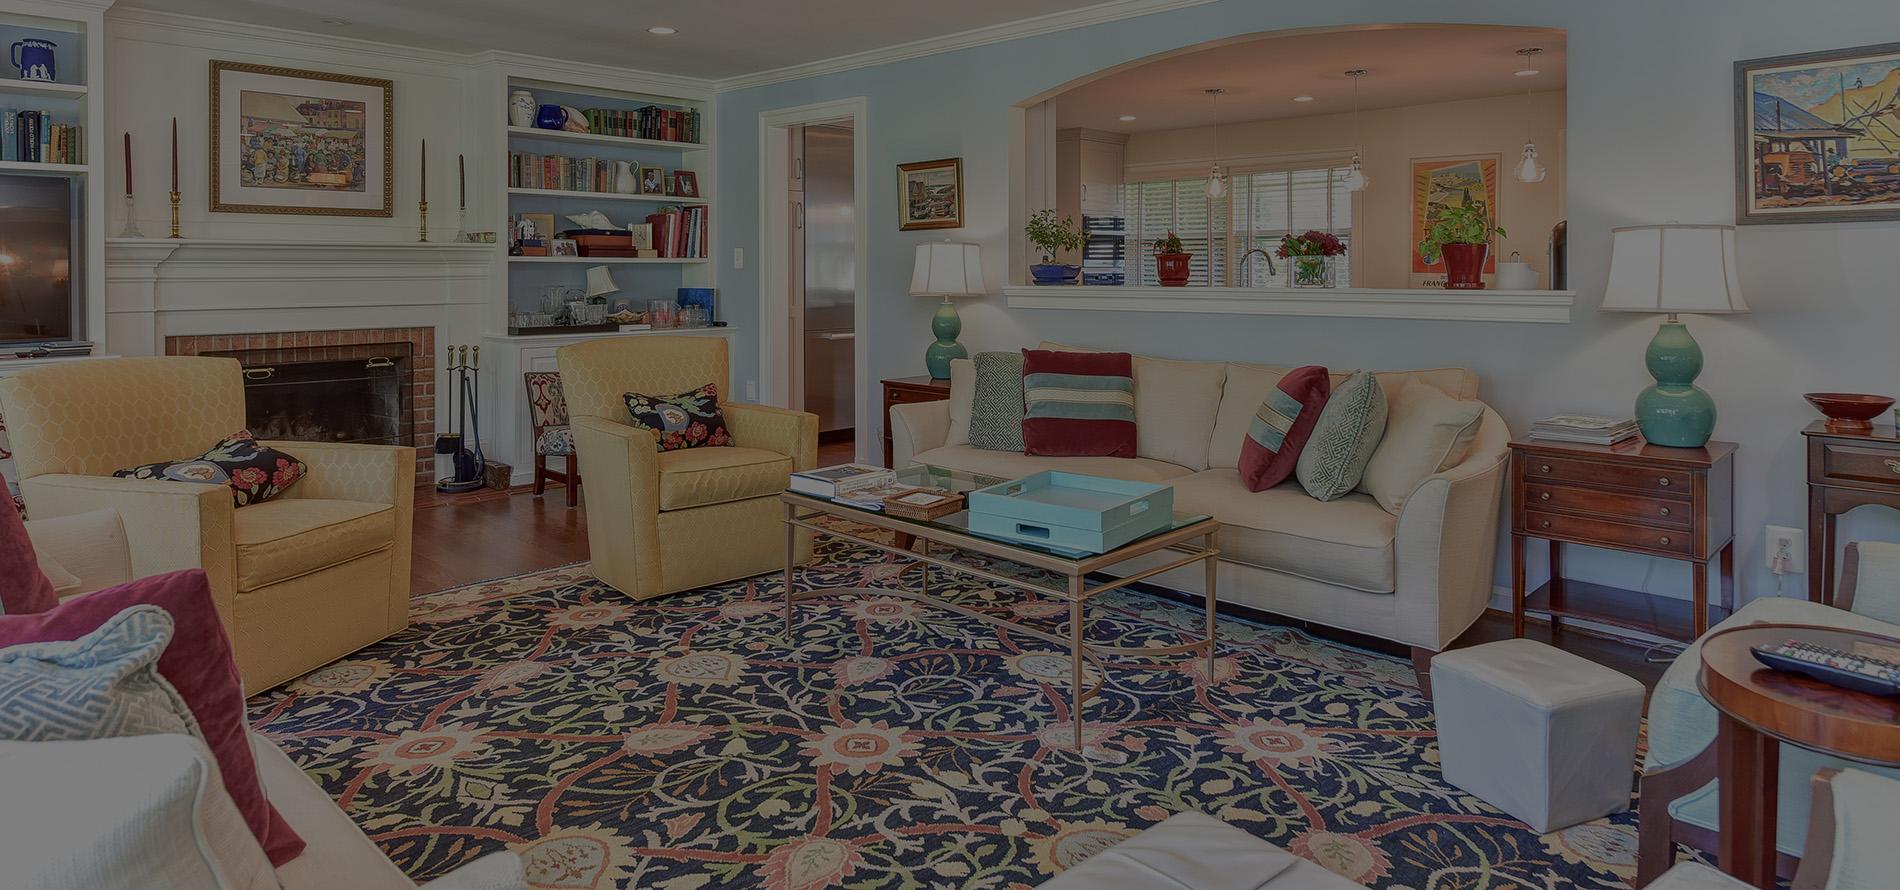 Home Remodel Arlington Pearystreet Hmp